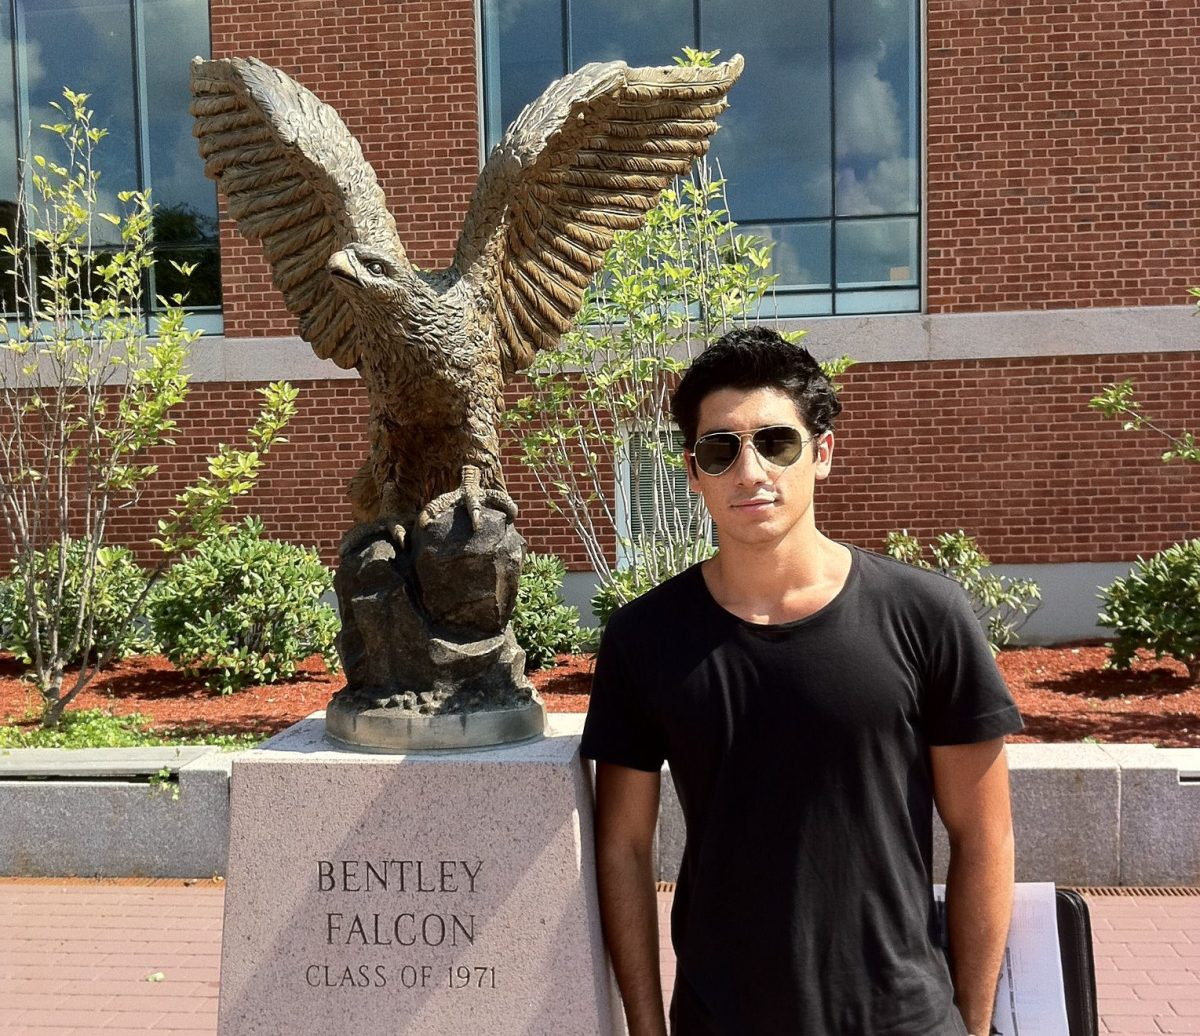 Alican Bentley University Falcon - Amerika'ya Taşınmak